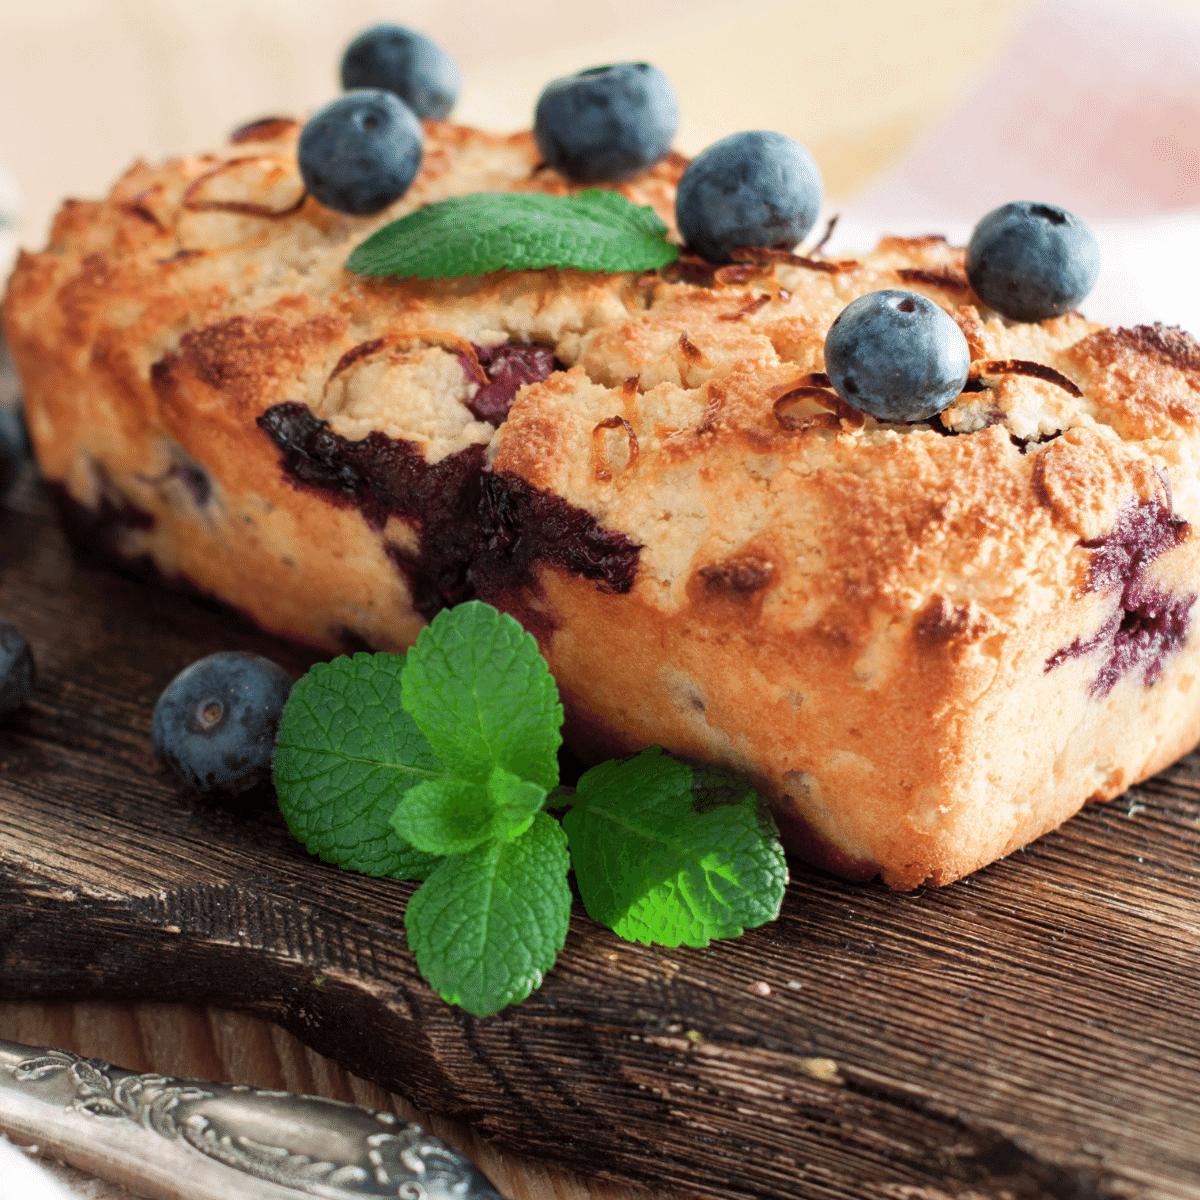 Low Carb Lemon Blueberry Bread FI